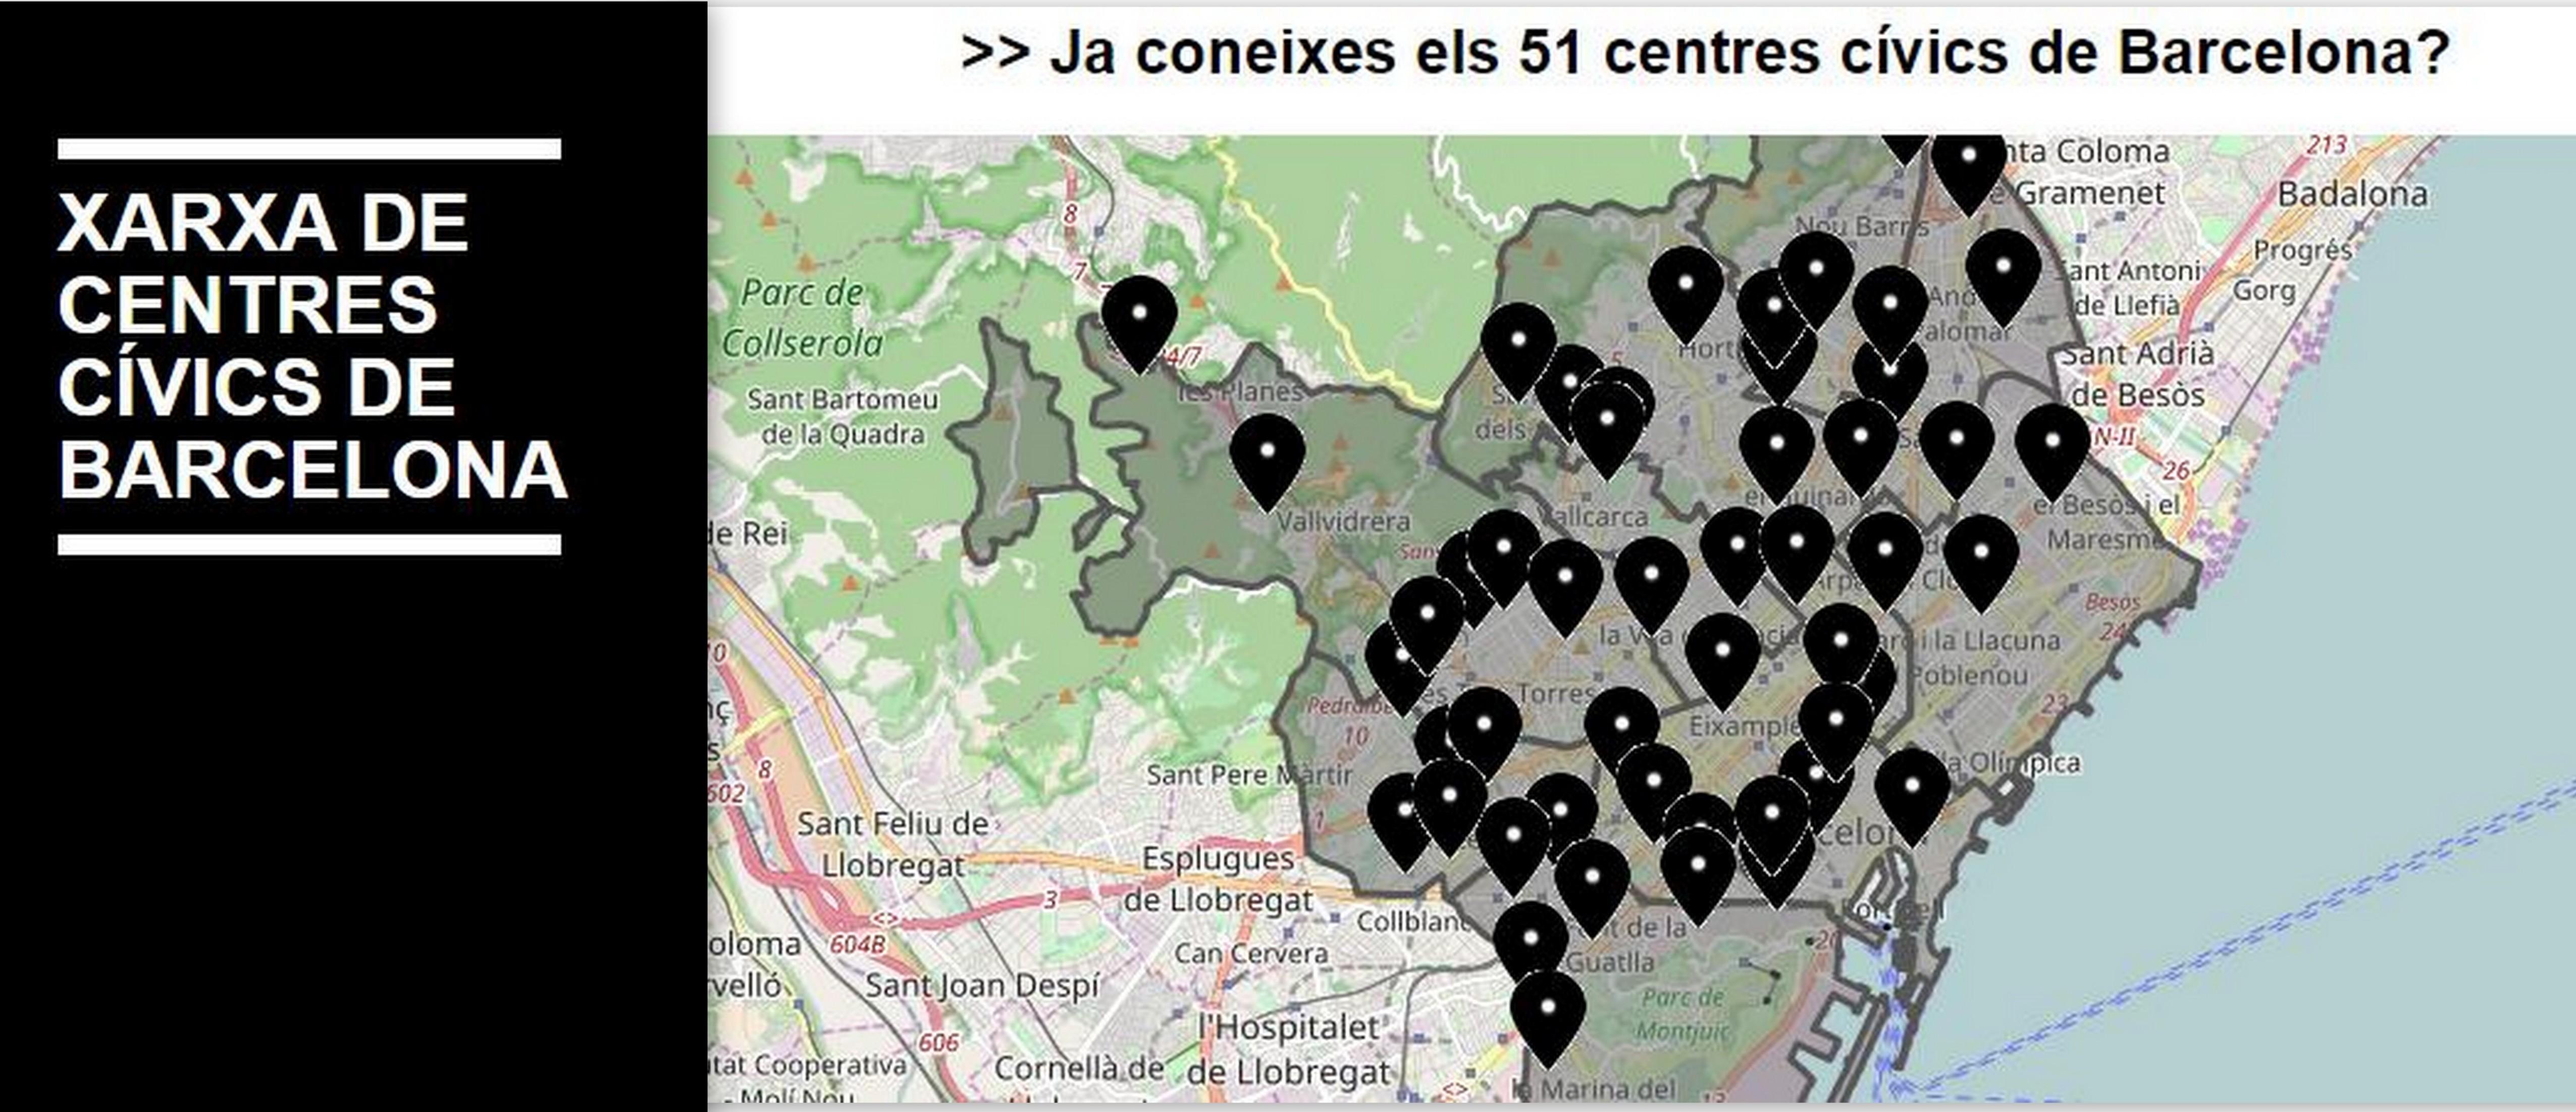 Collage Xarxa CC BCN i mapa 51 Centres Civics